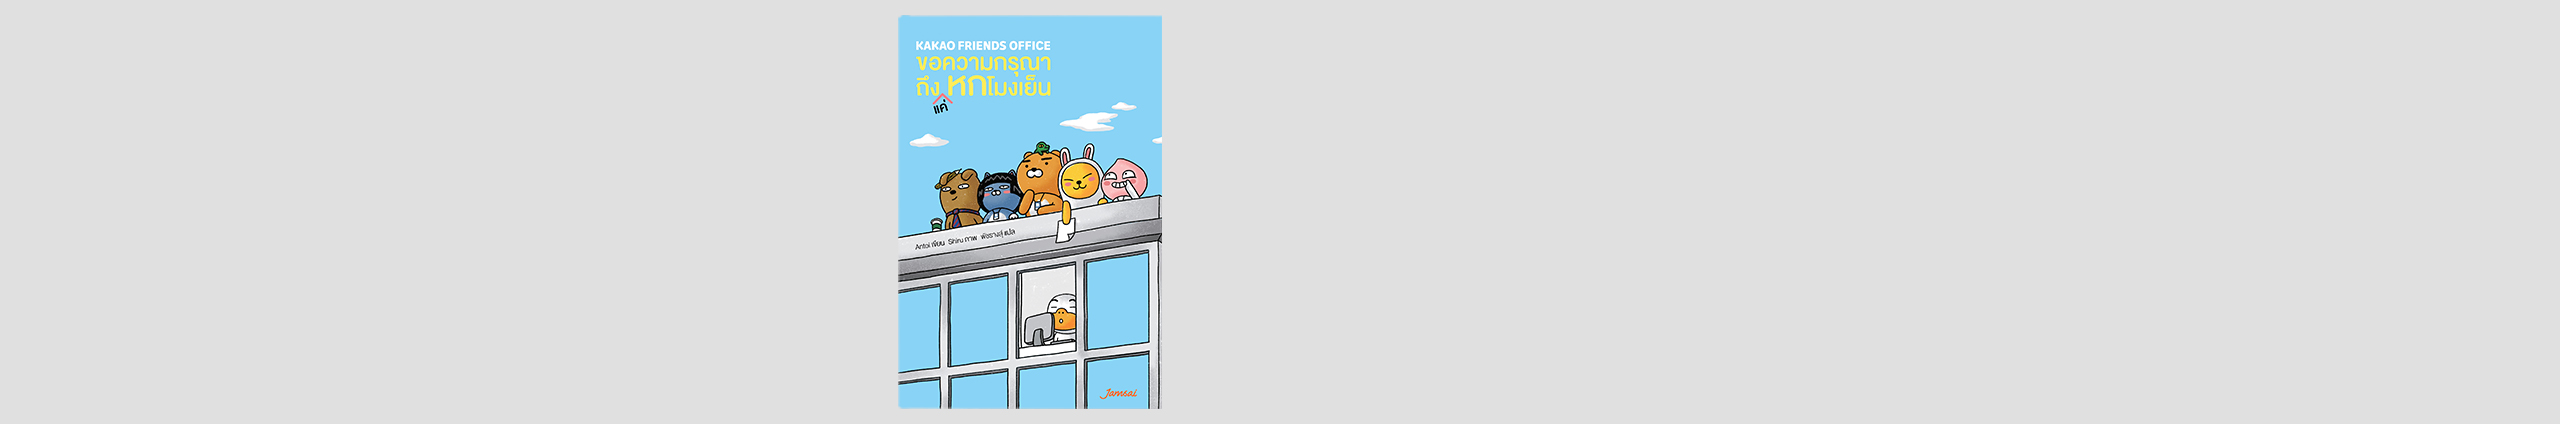 Kakao Friends Office 1 : ขอความกรุณาถึงแค่หกโมงเย็น